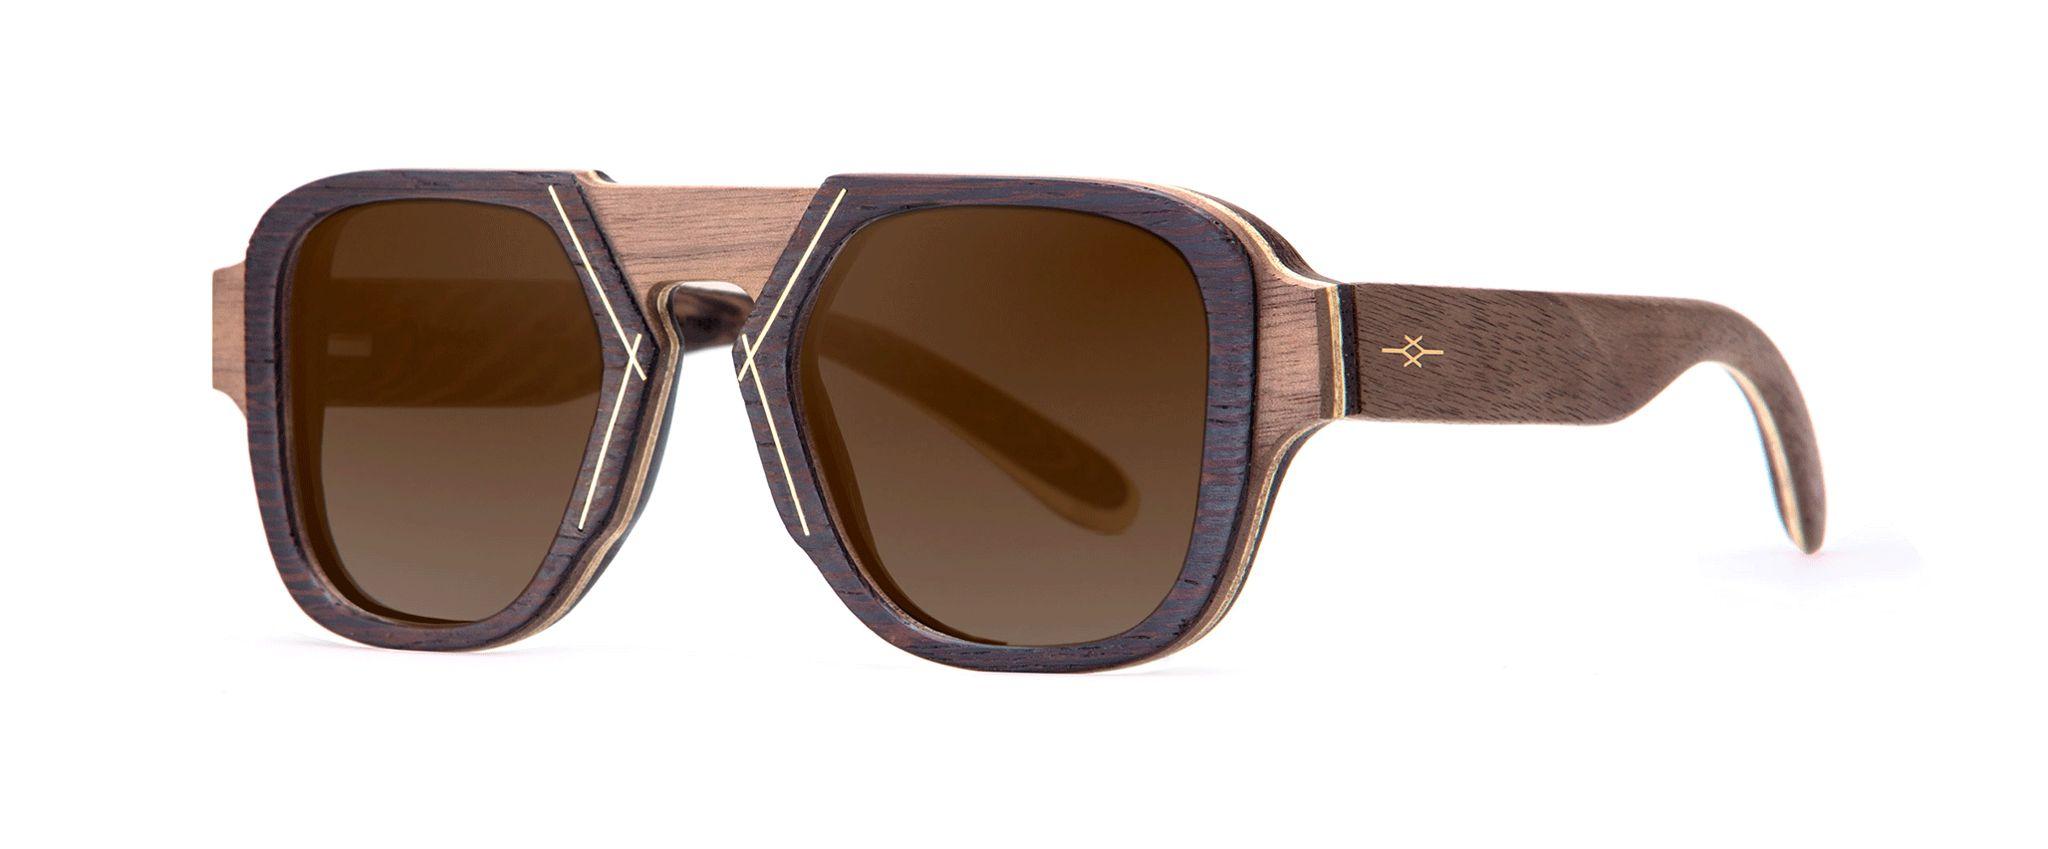 Voodoo Vakay designer sunglasses Walnut